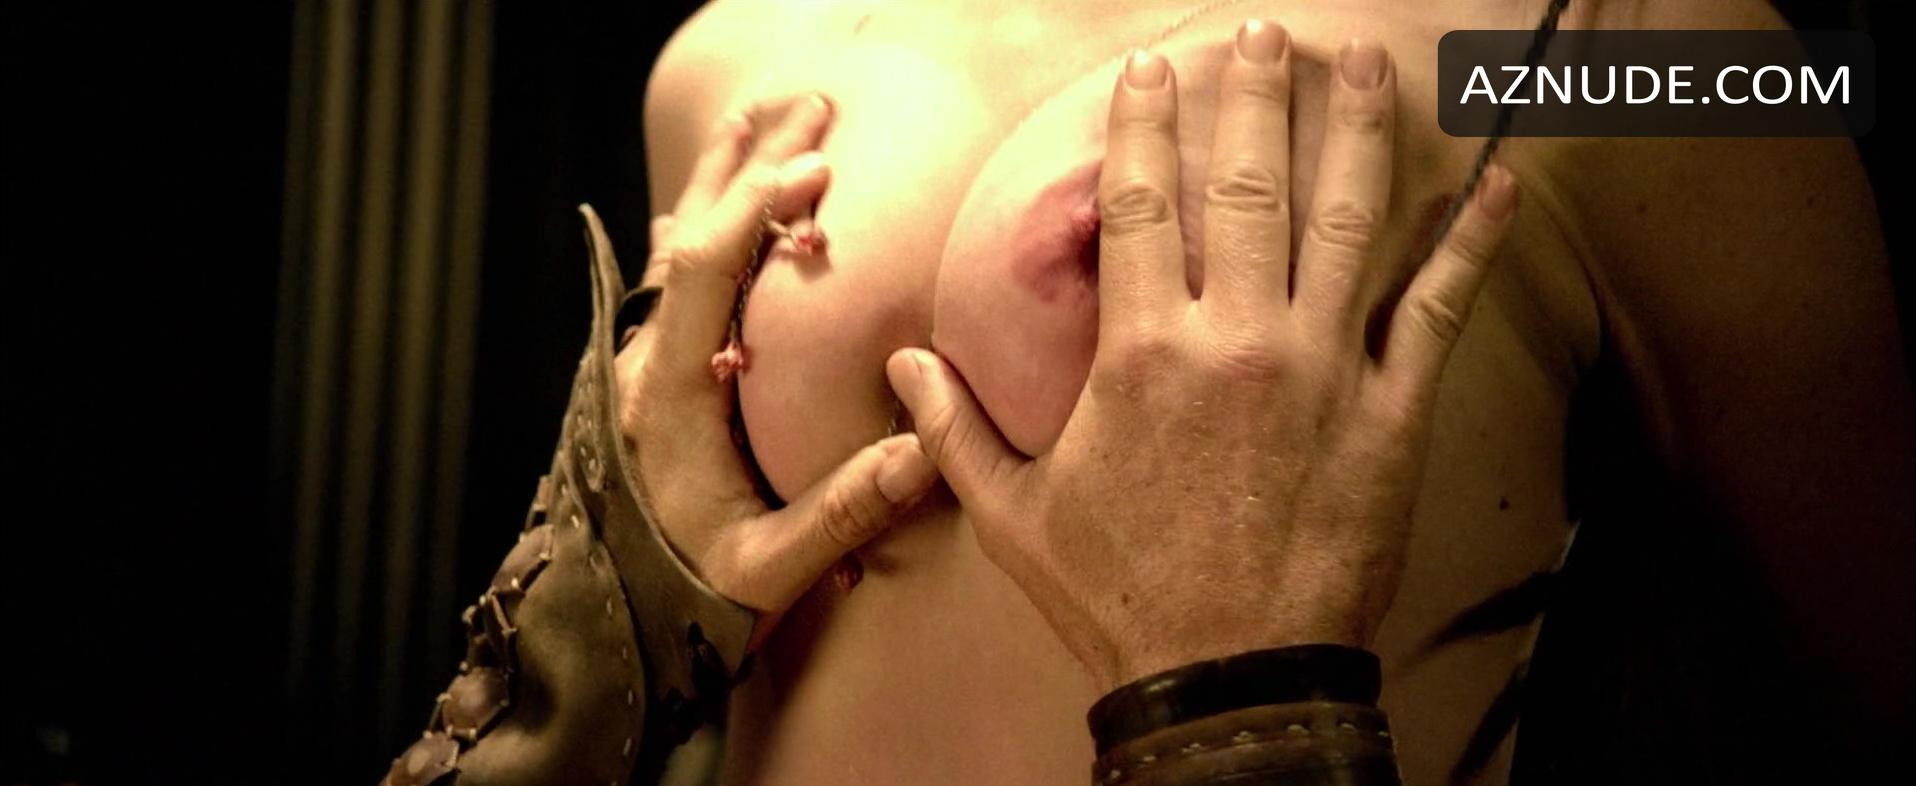 Think, Eva laskari hot sex scene